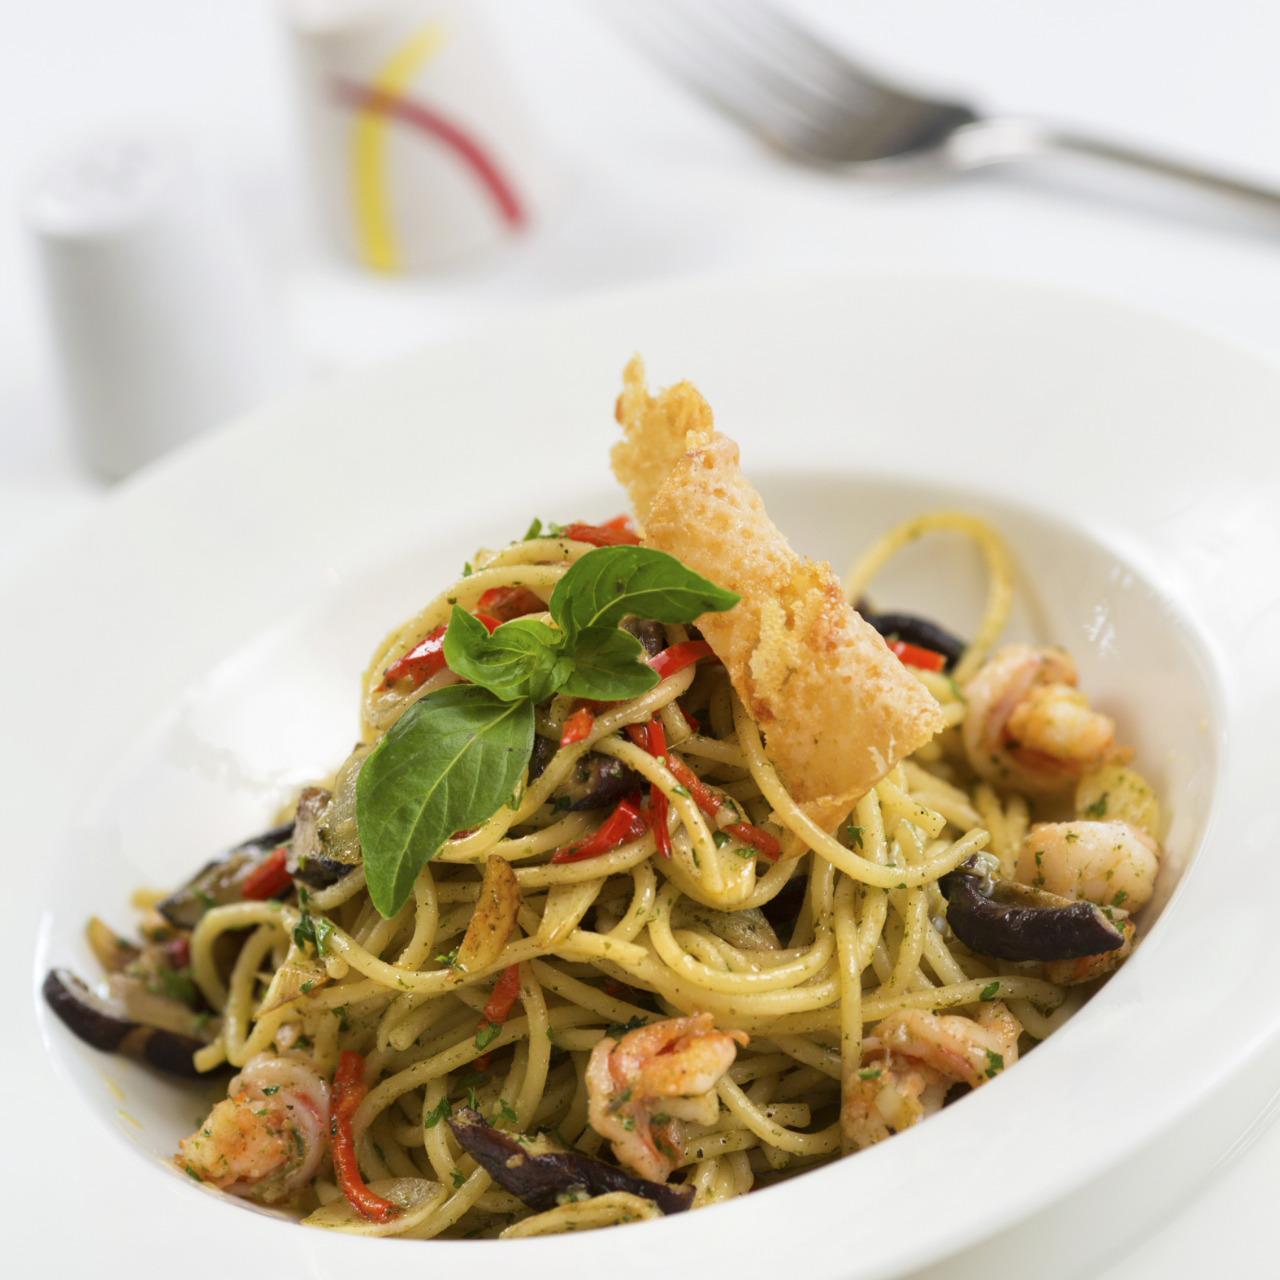 spaghettii aglio